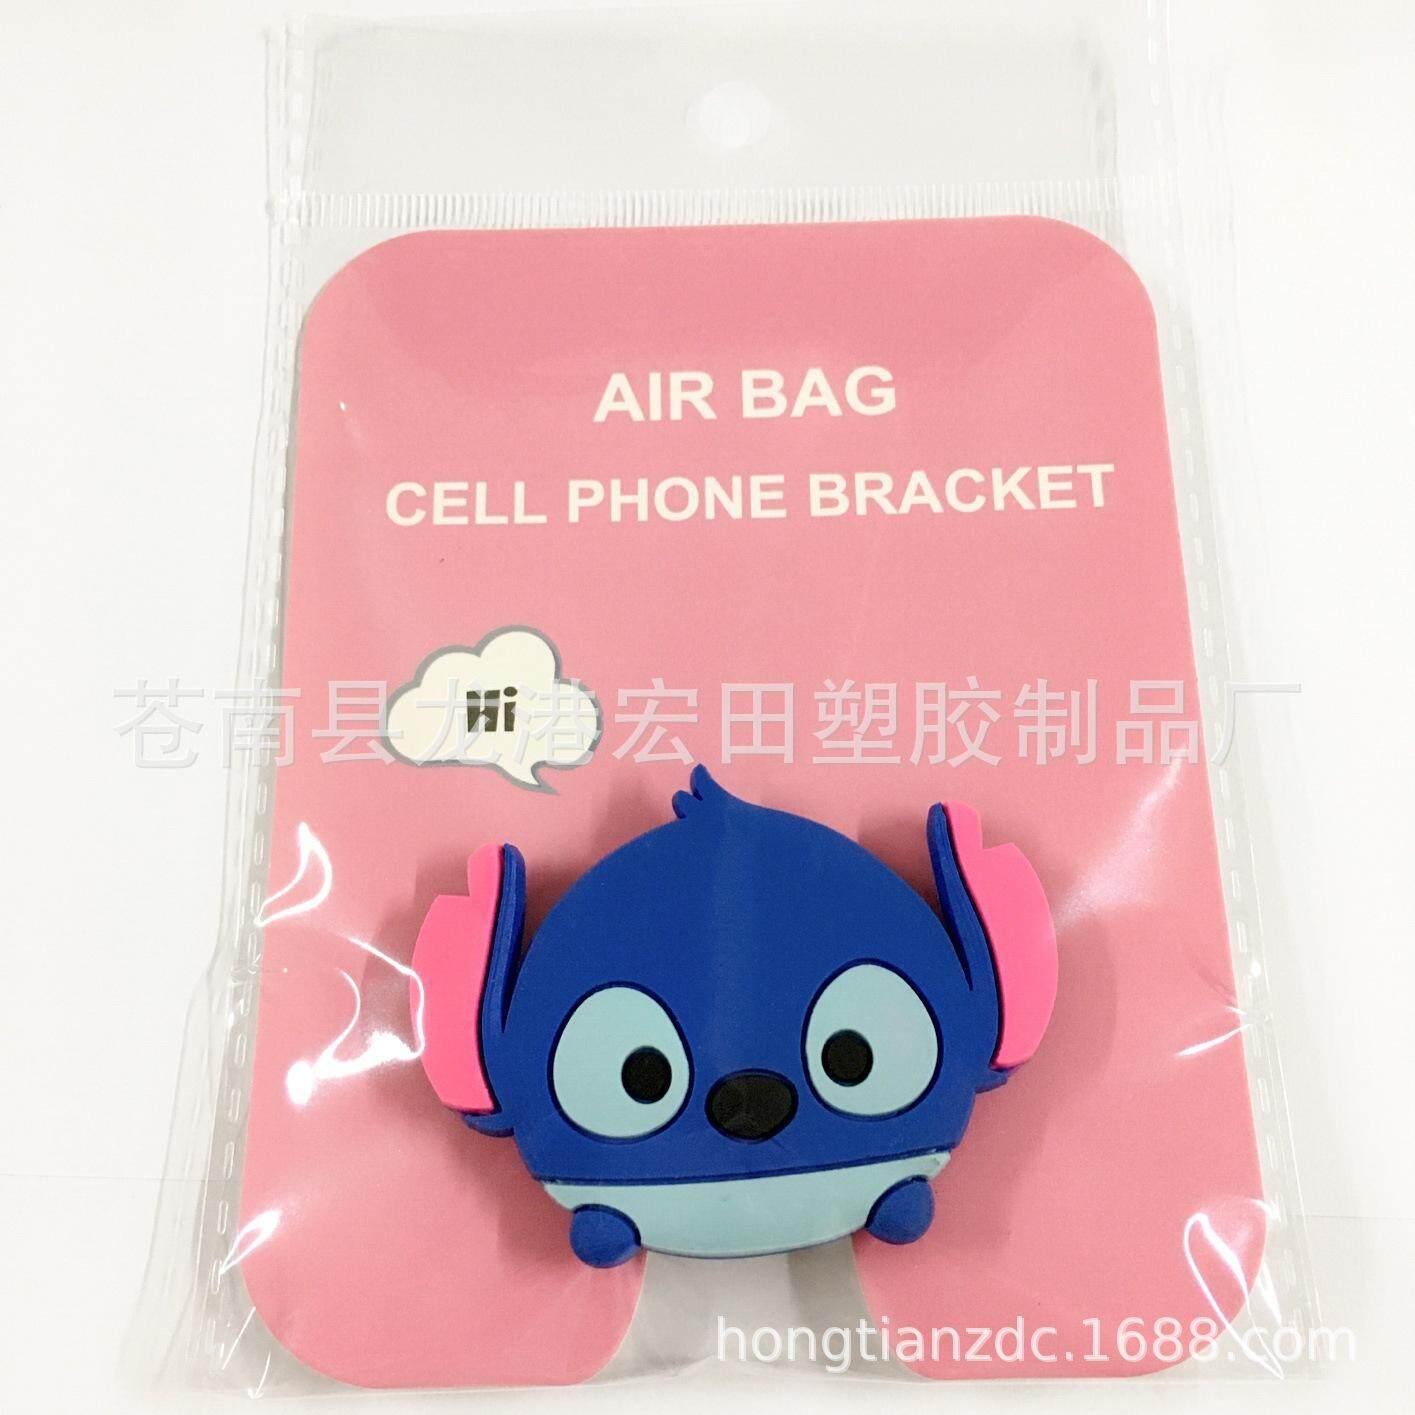 Cute Stitch Cartoon Pattern Airbag Cellphone Bracket Phone Stand Holder